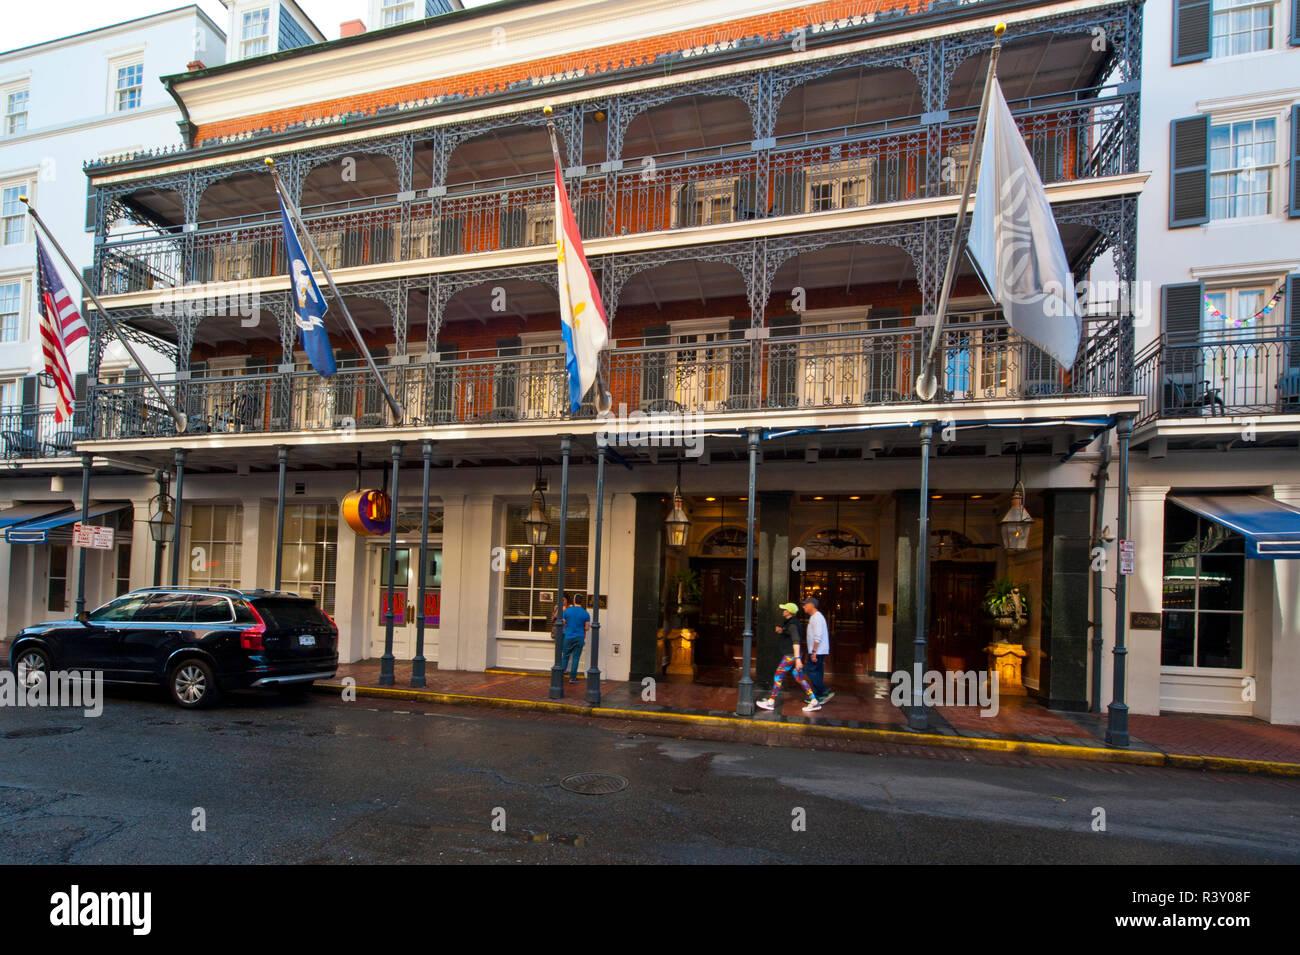 Usa Louisiana New Orleans French Quarter Royal Sonesta Hotel Stock Photo Alamy